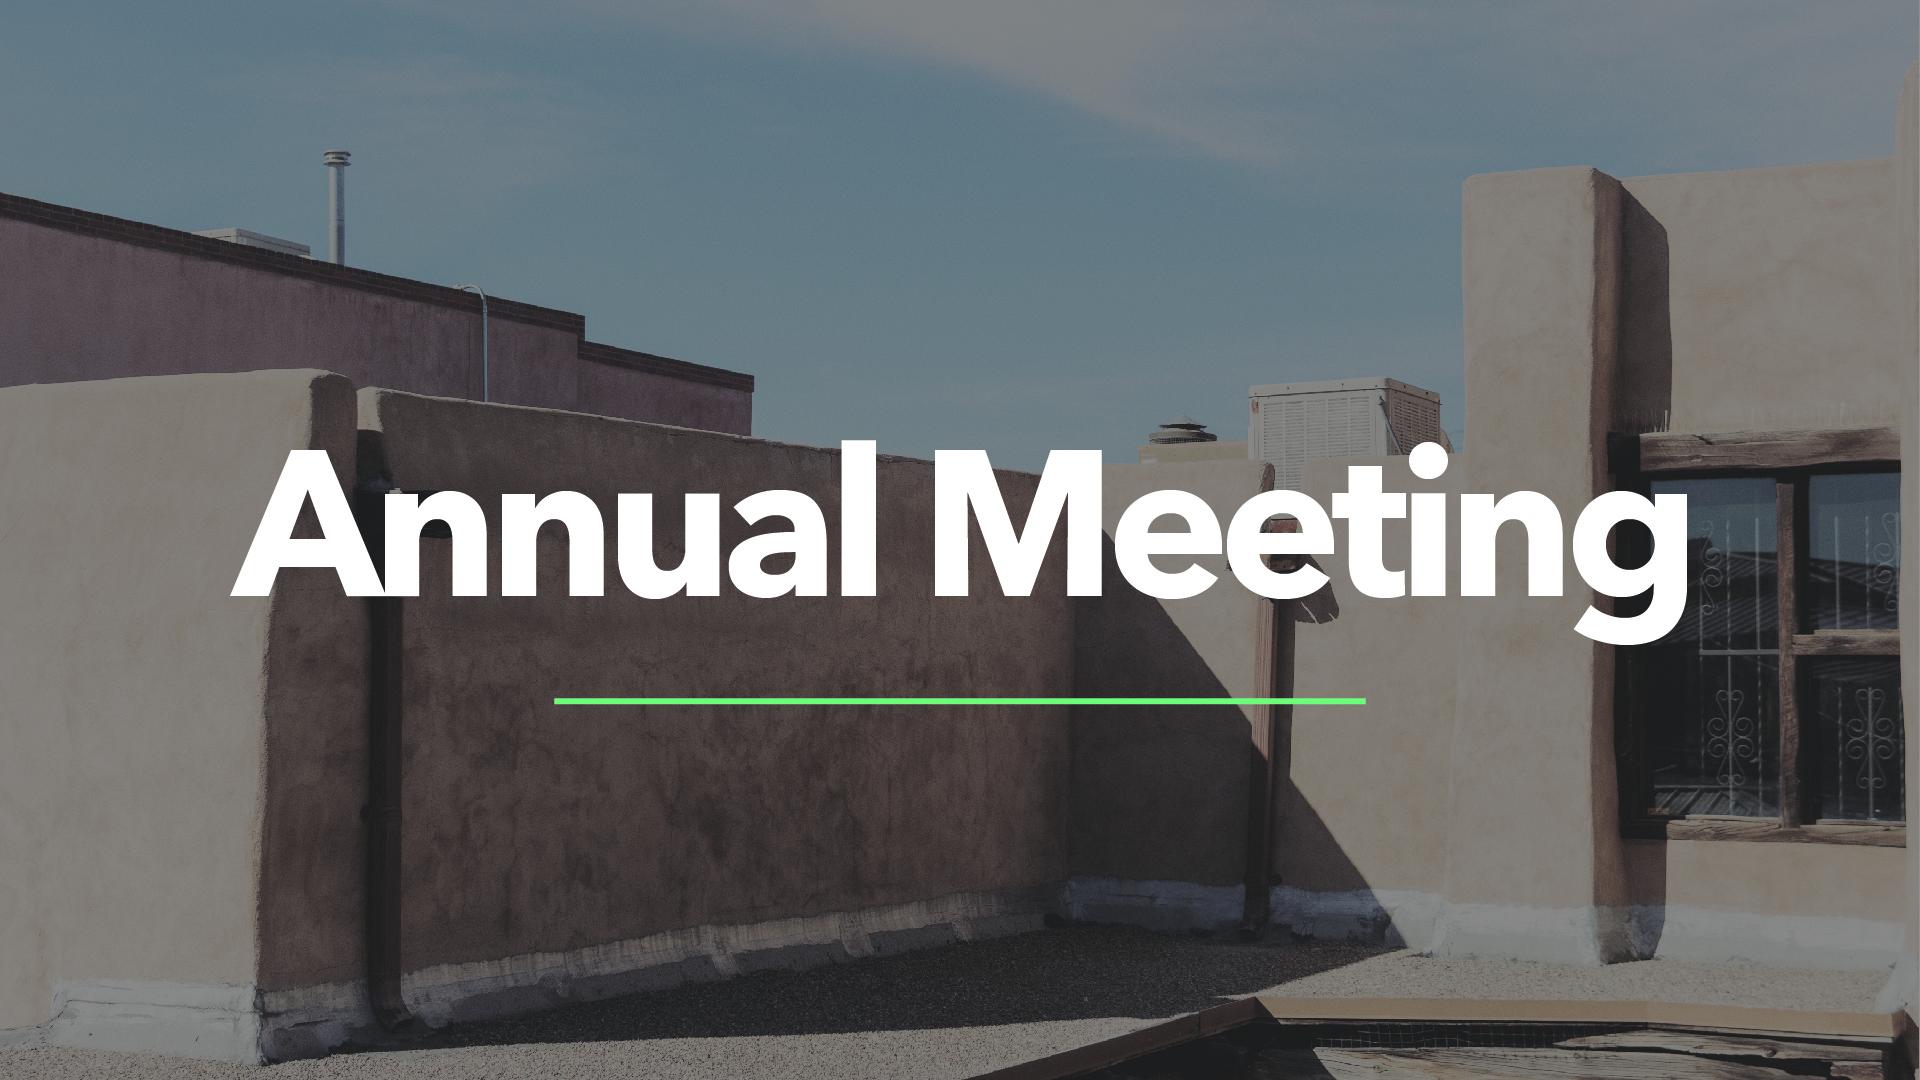 annual-meeting-image_PCO.jpg